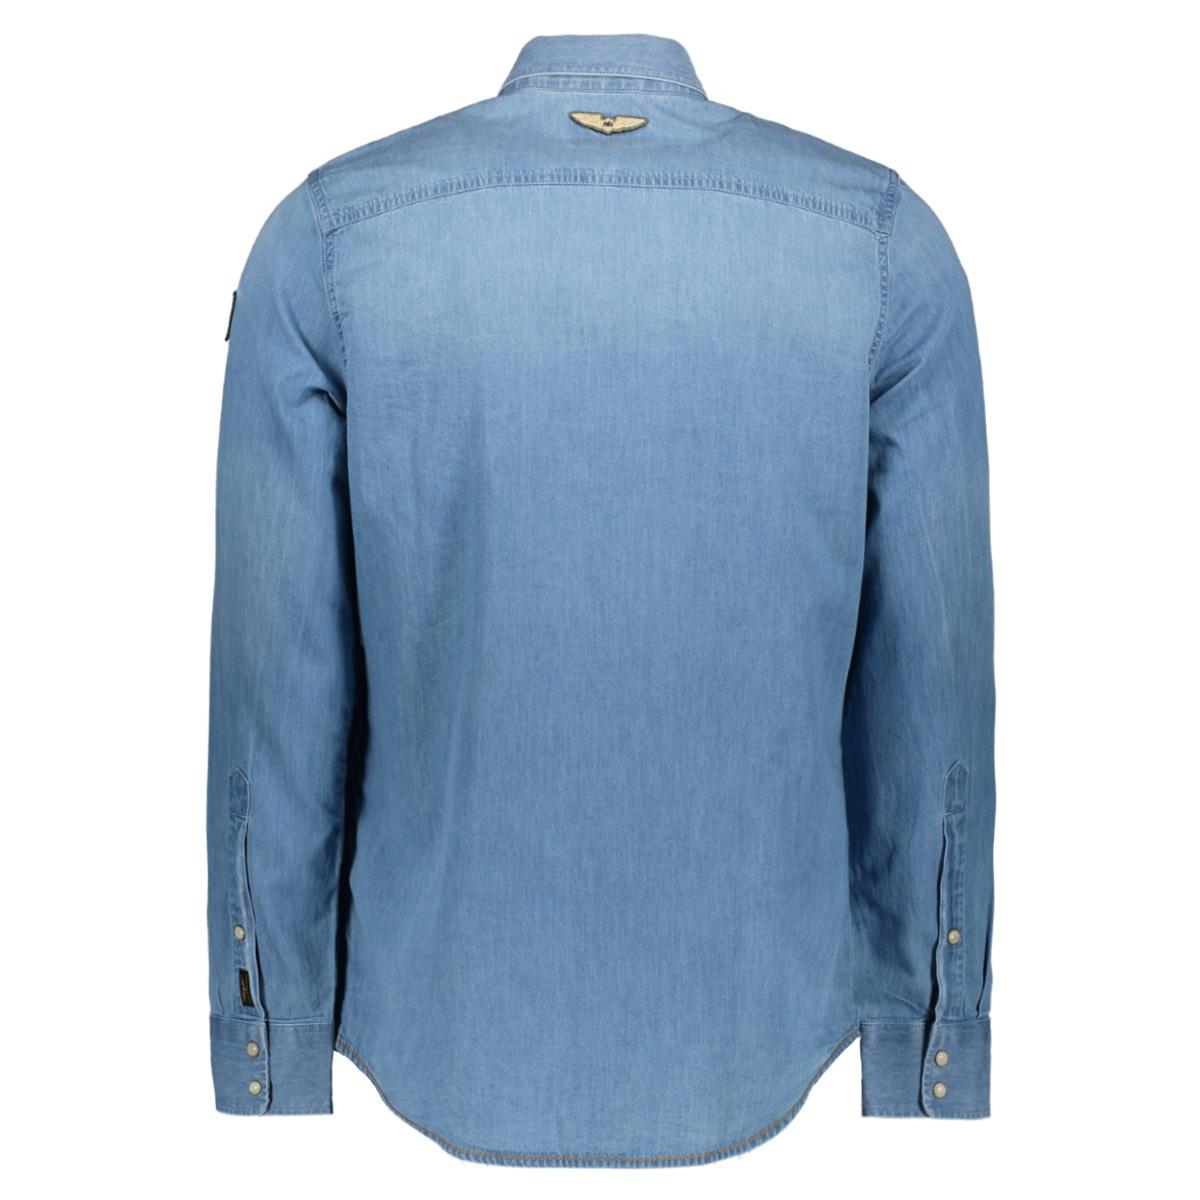 psi191215 pme legend overhemd 590